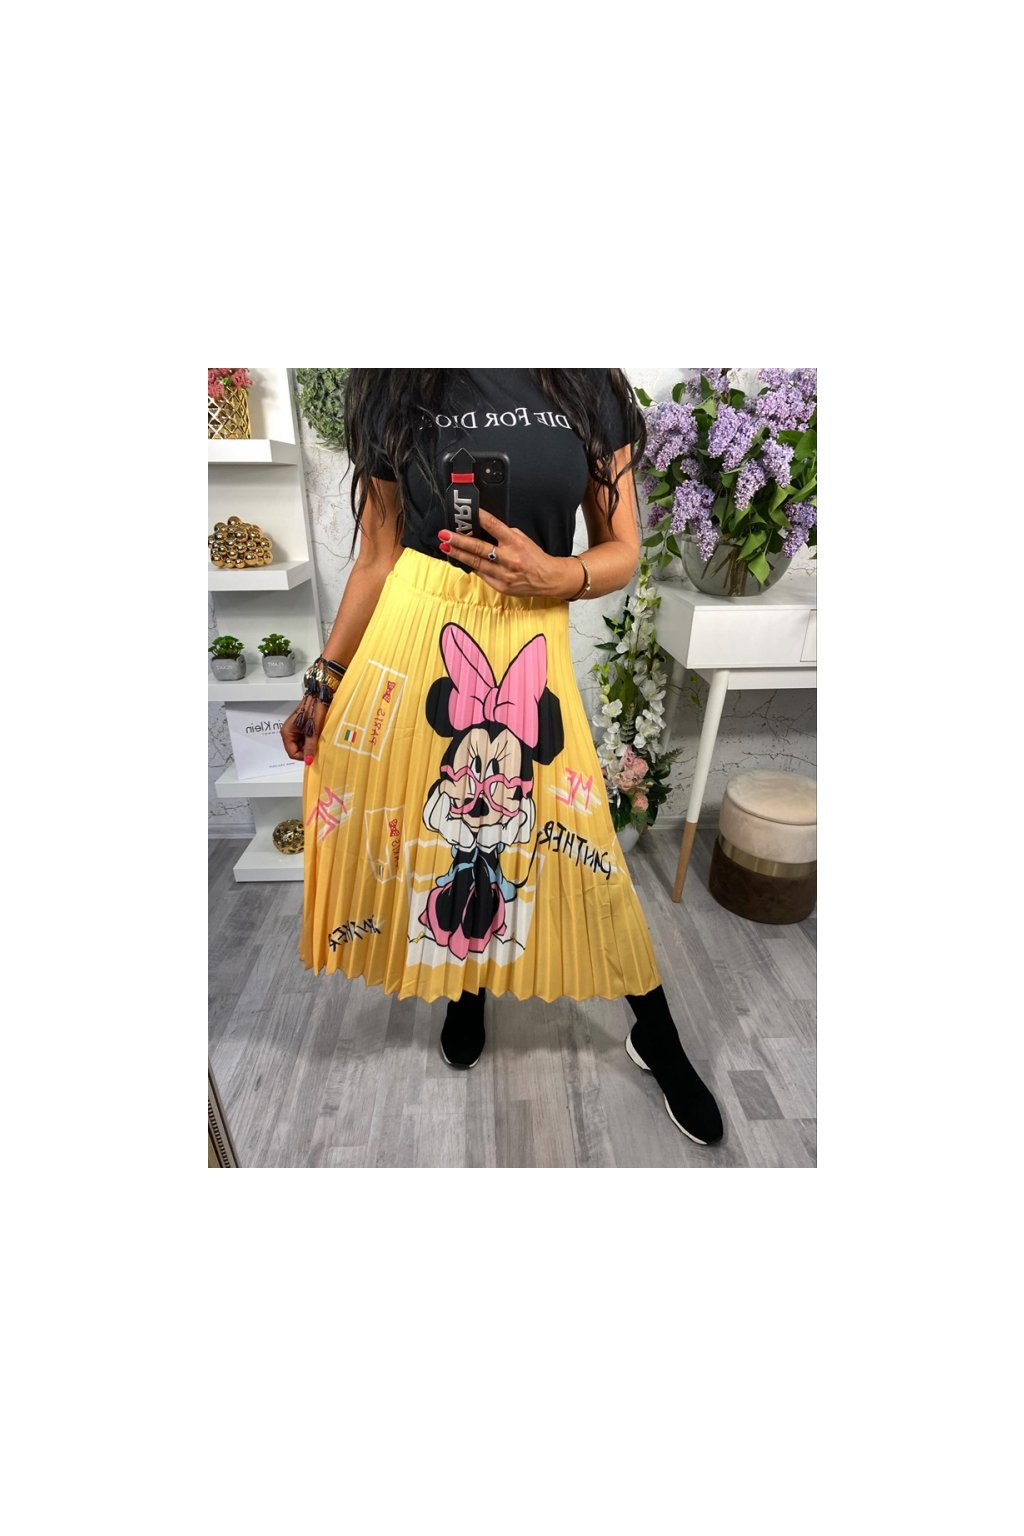 Dokonalá MIDI sukně Minnie